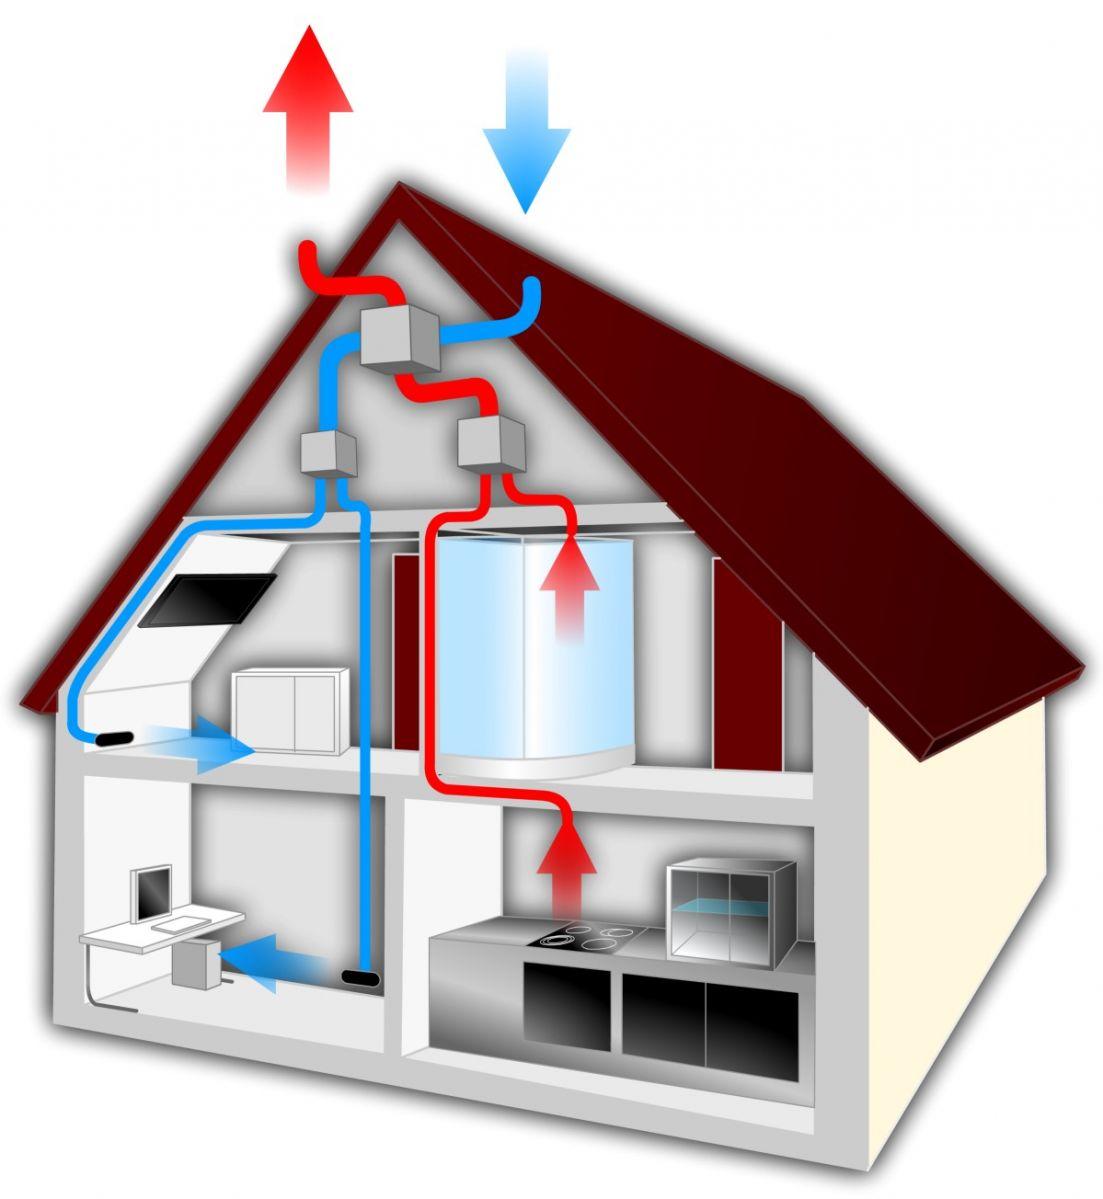 rekuperace tepla u domo